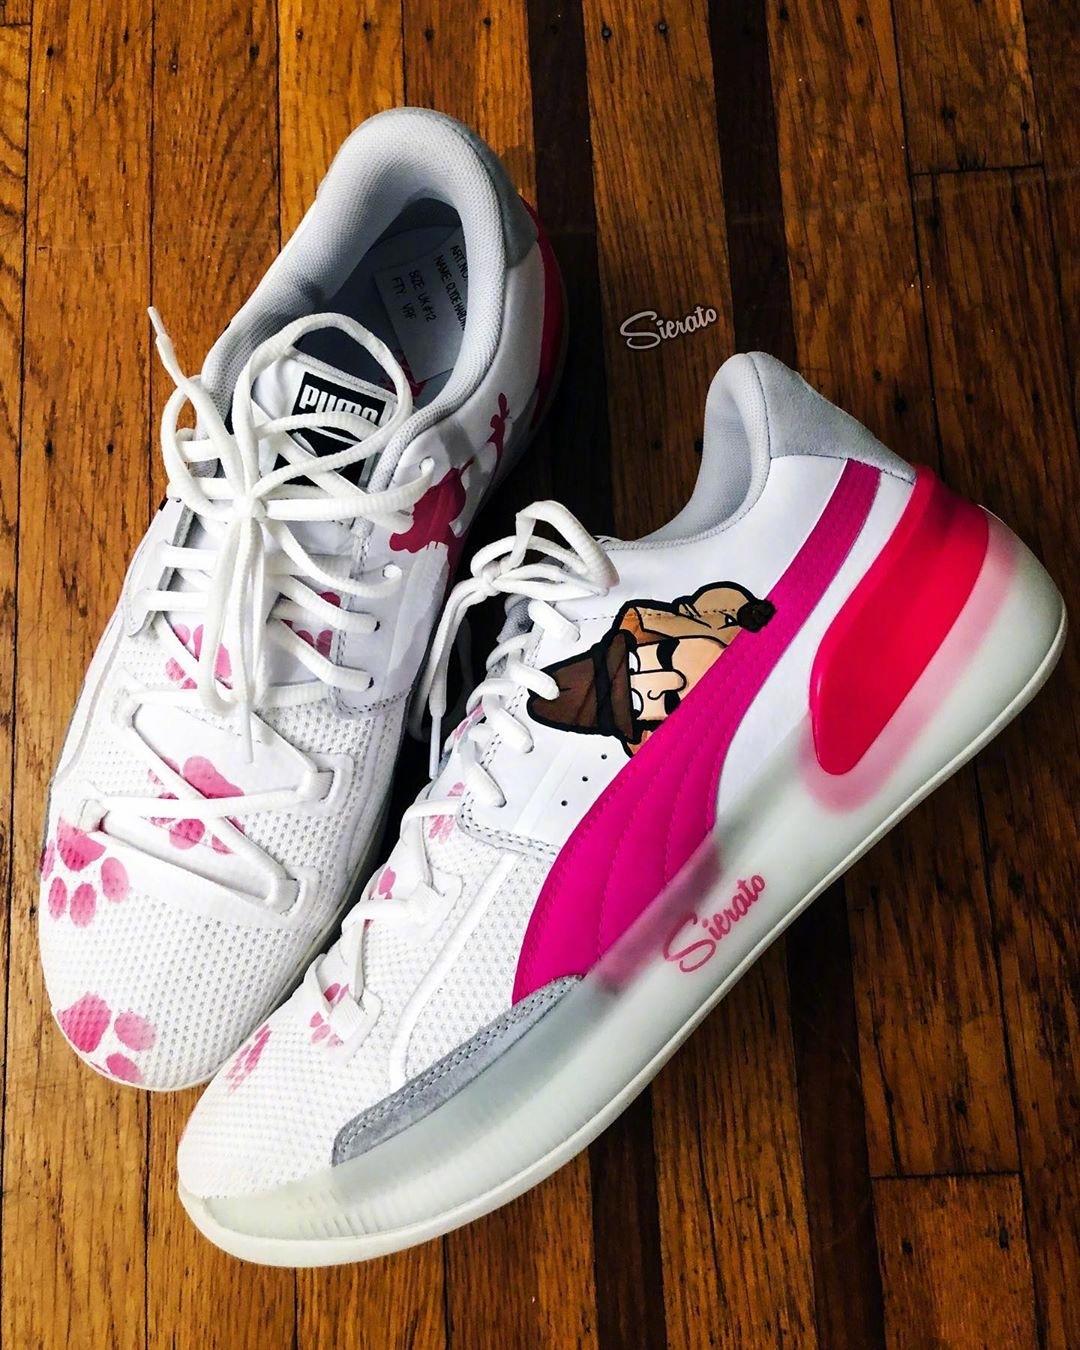 clyde hardwood puma pink \u003e Clearance shop